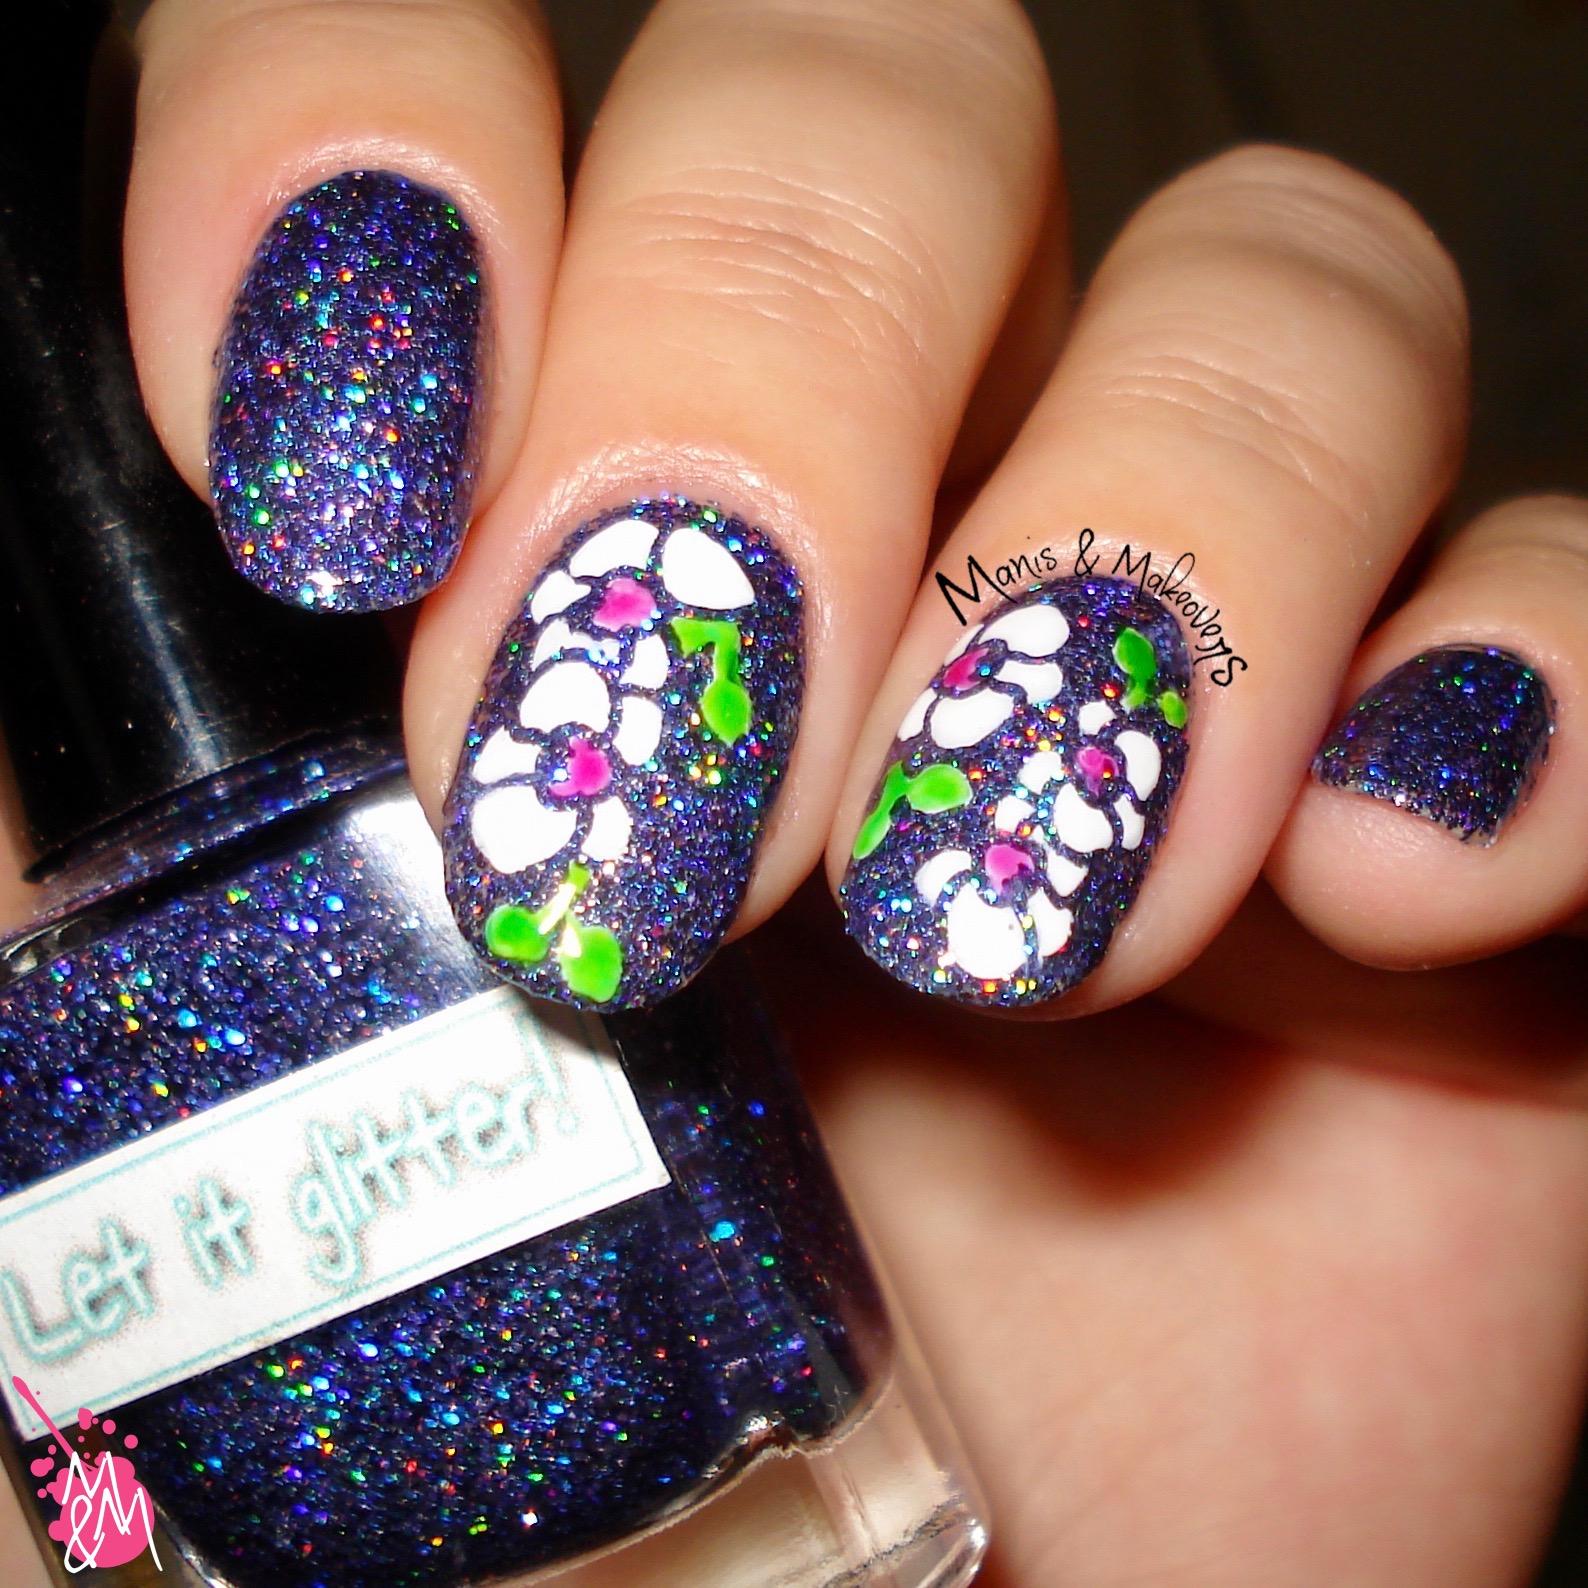 Manis & Makeovers: The Digit-al Dozen\'s Indie Love - Let It Glitter ...